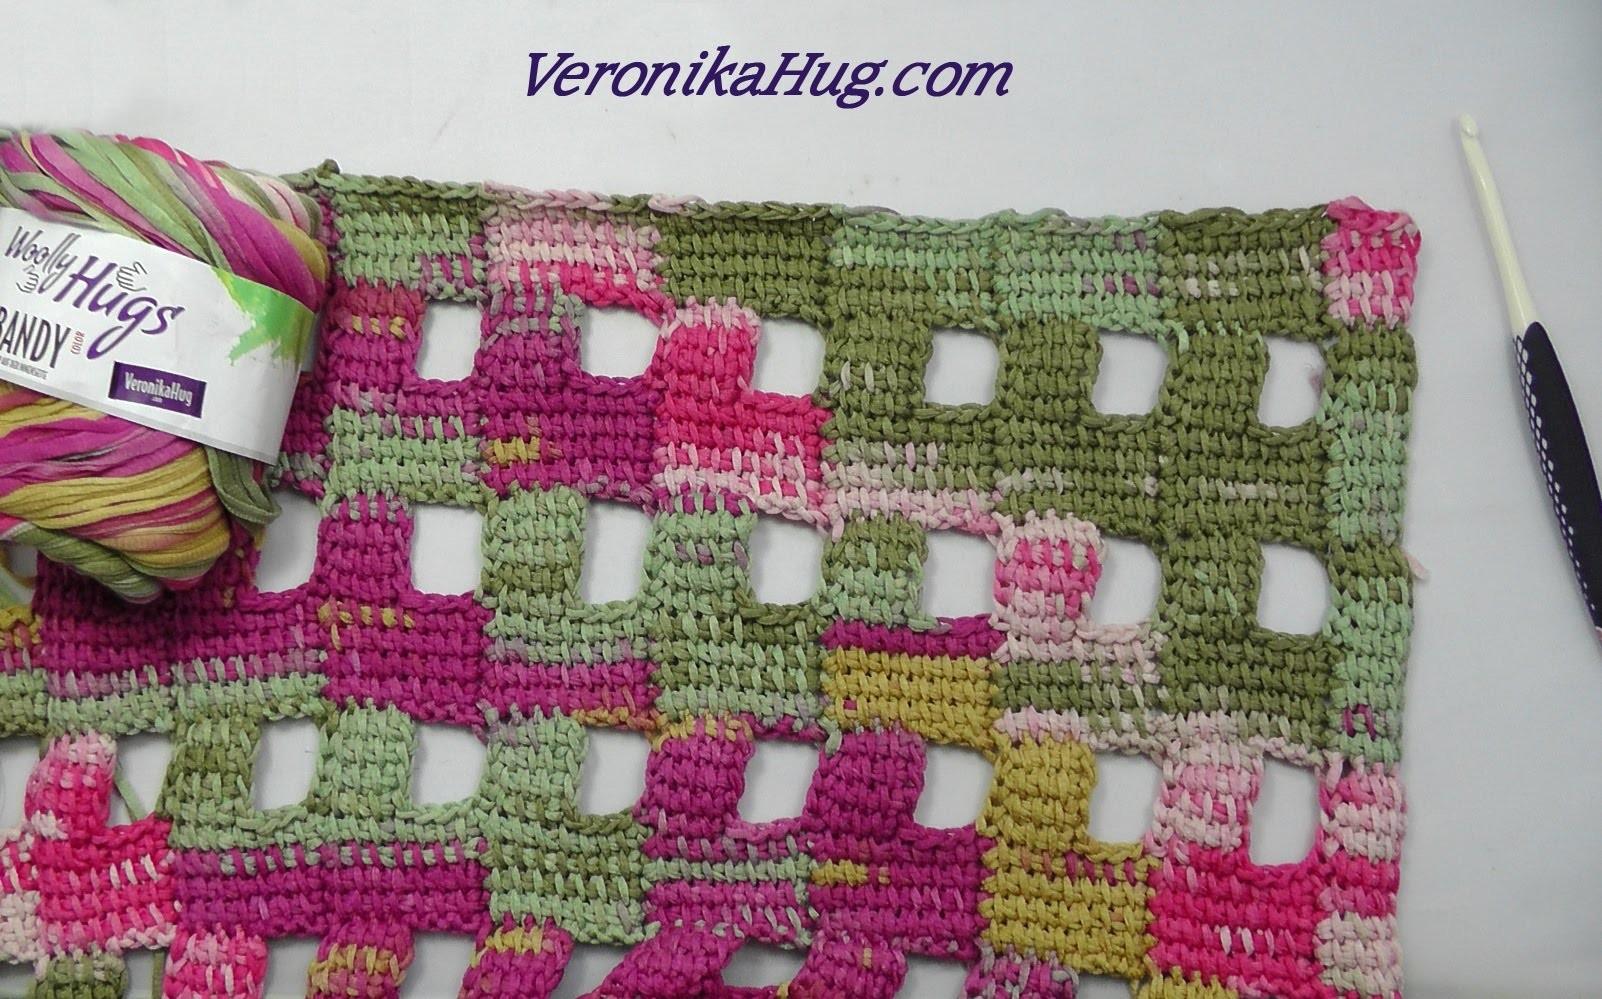 Tunesisch Häkeln - Tuch RAPALLO - Abschlusskante oben - Woolly Hugs BANDY 04 - Veronika Hug